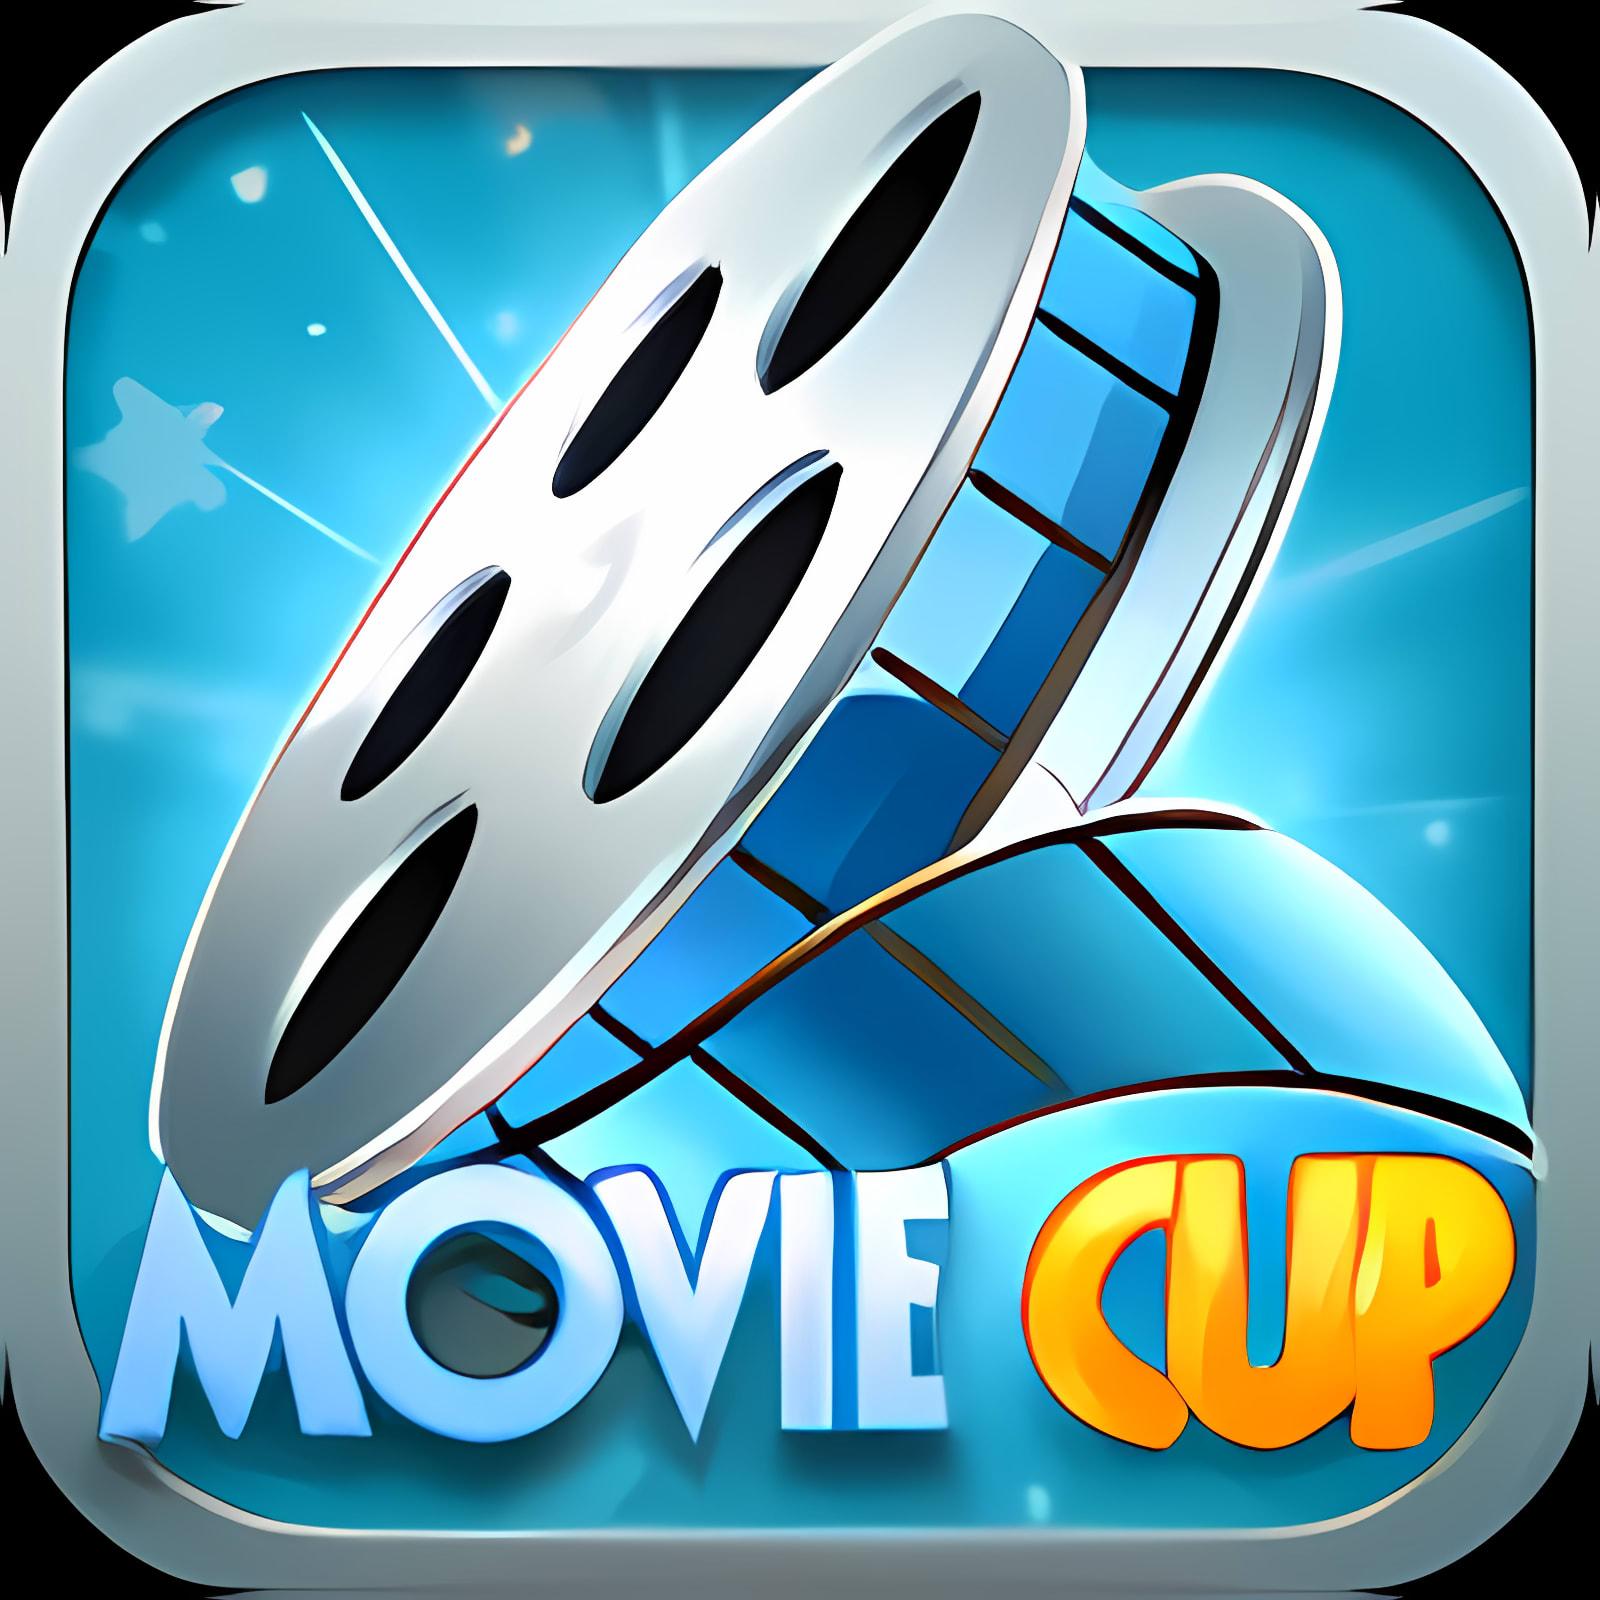 MovieCup v1.9.4